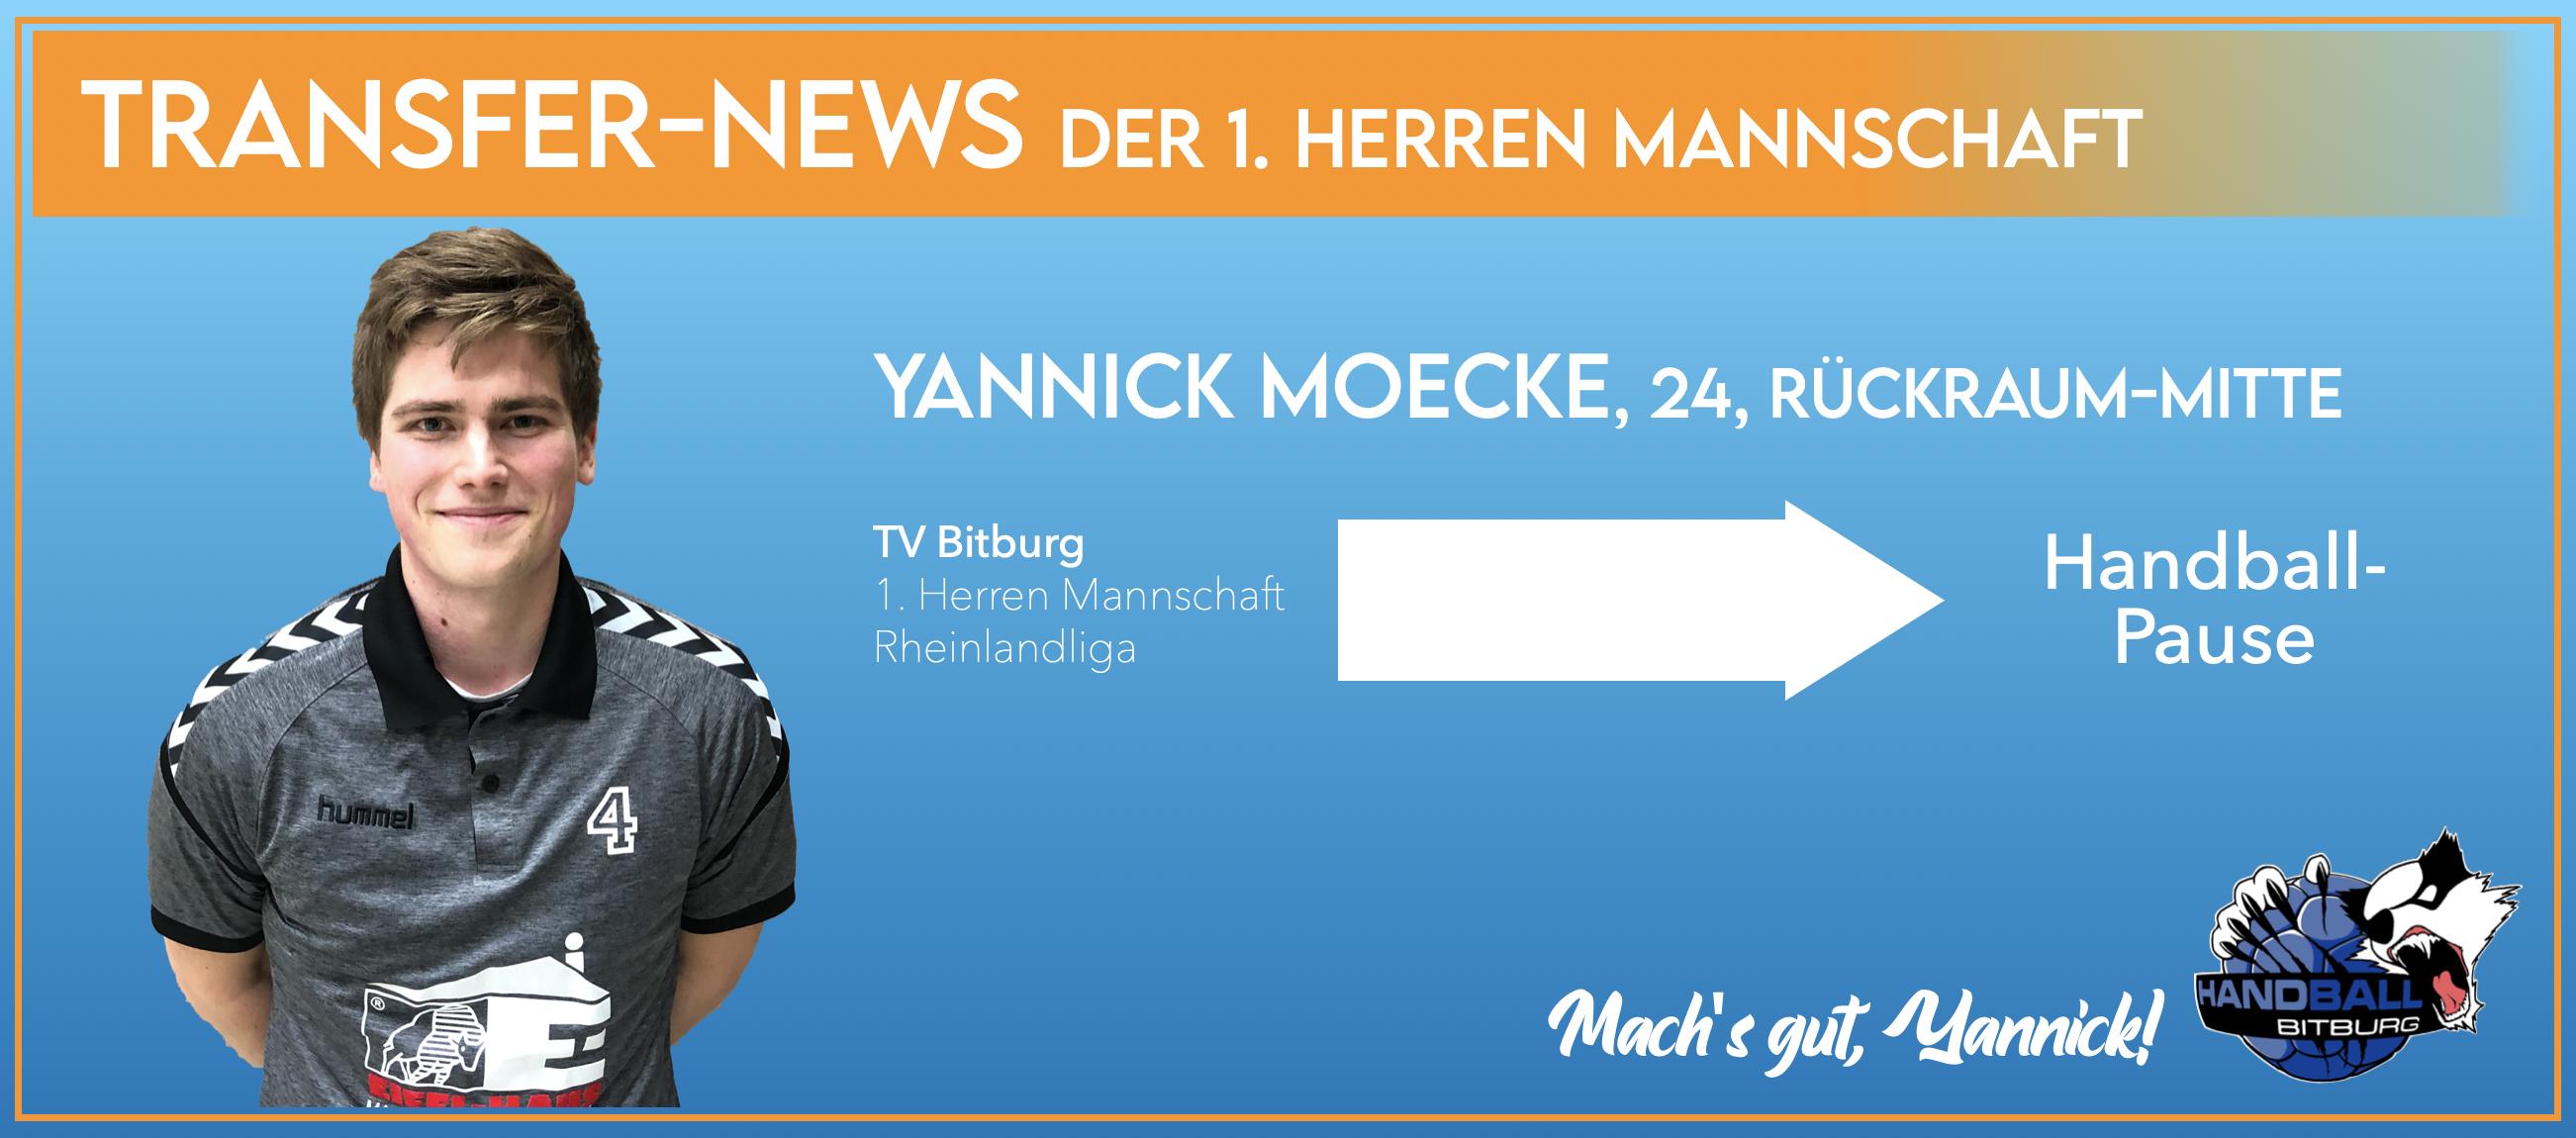 Yannick Moecke verlässt den TV Bitburg